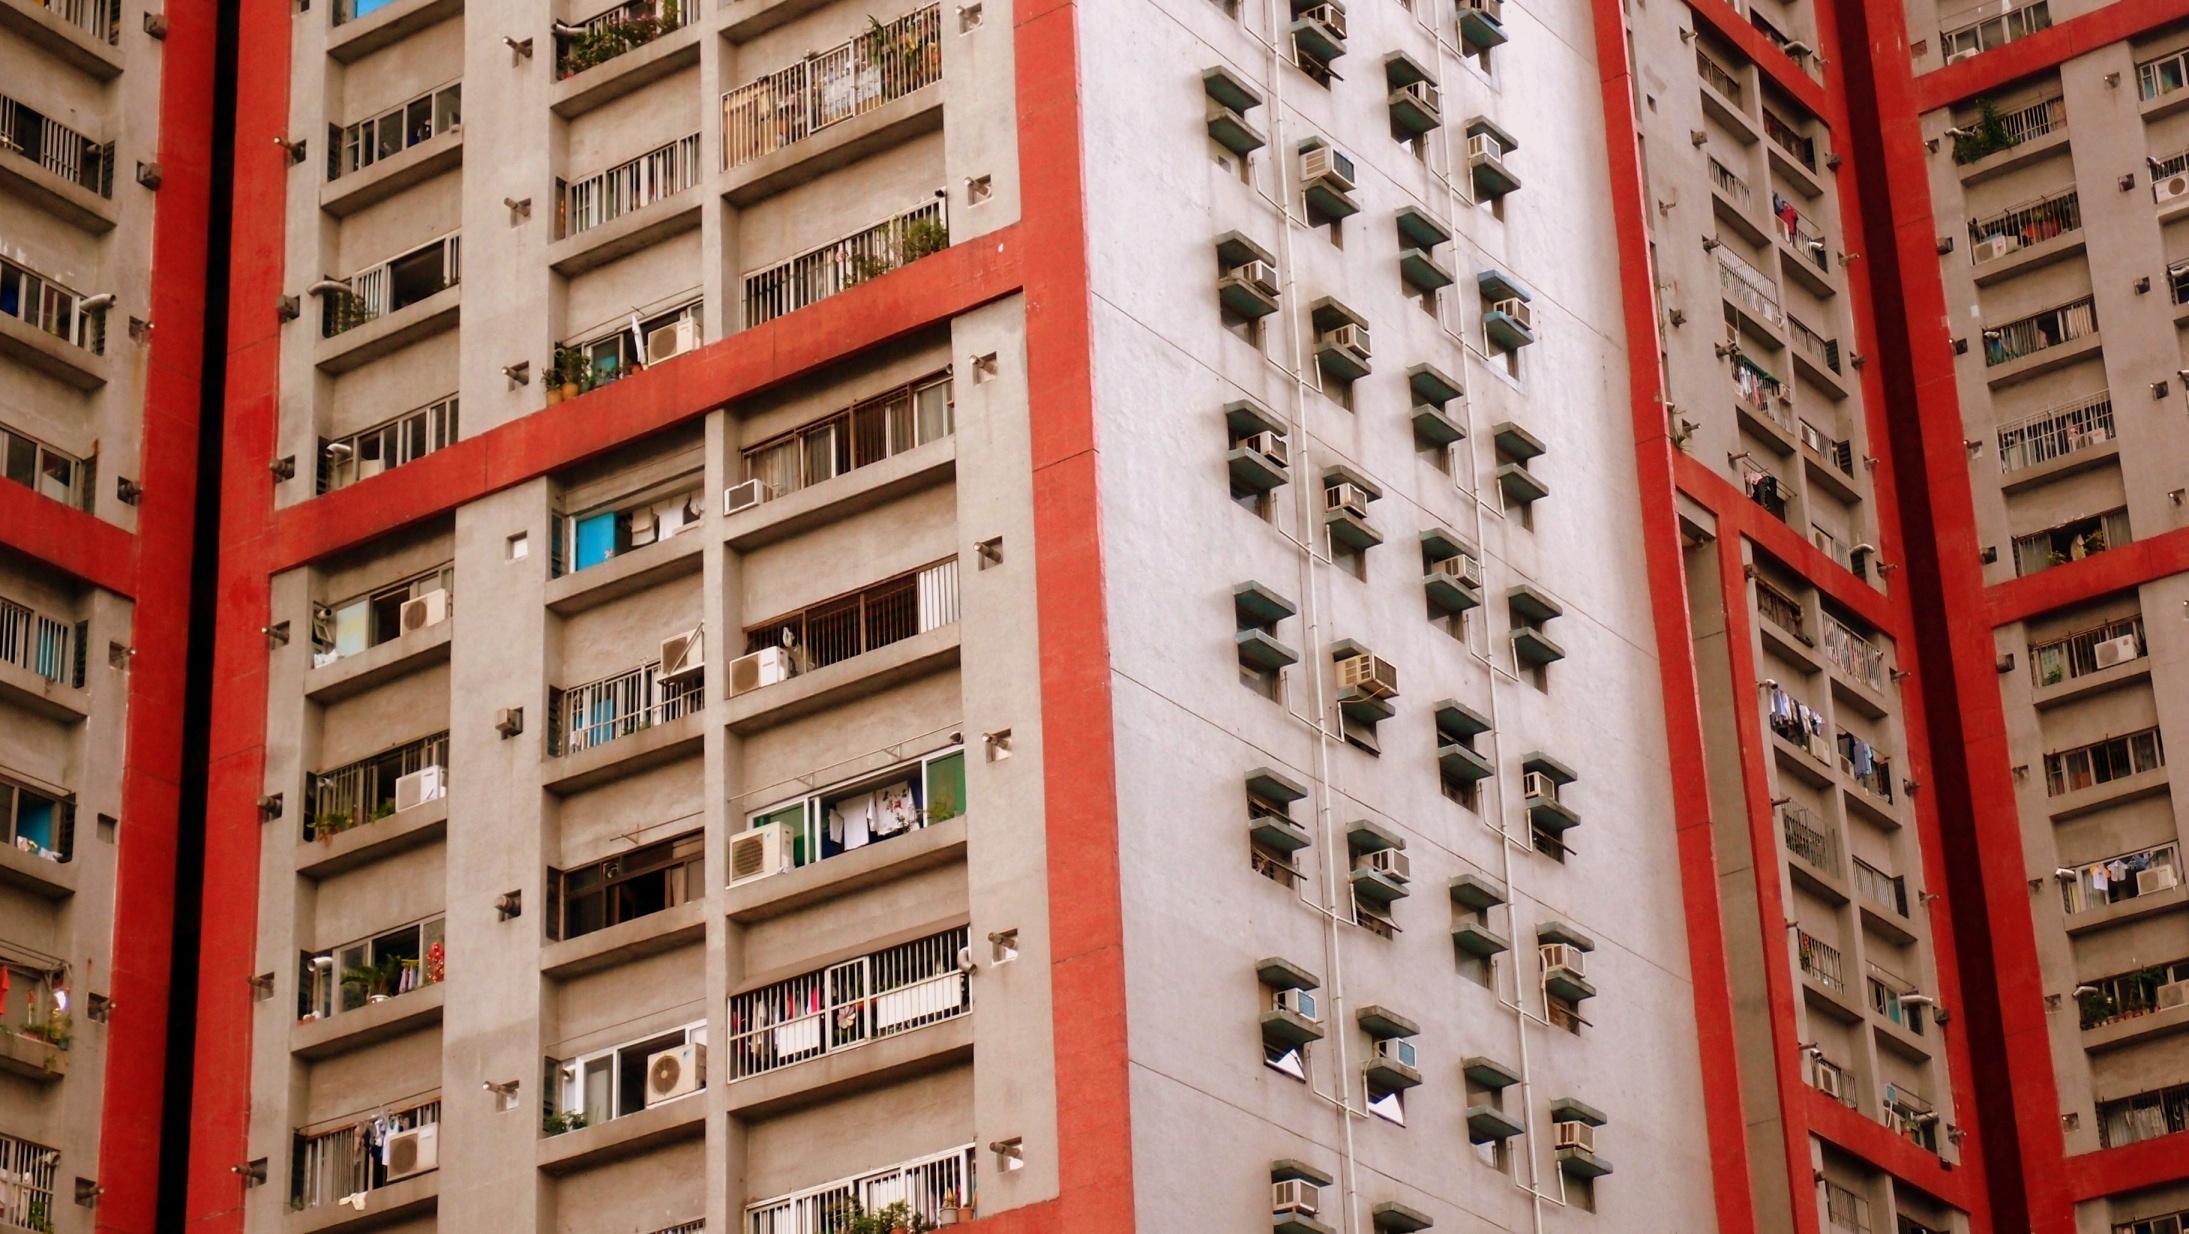 more public housing in Ngau Tai Kok